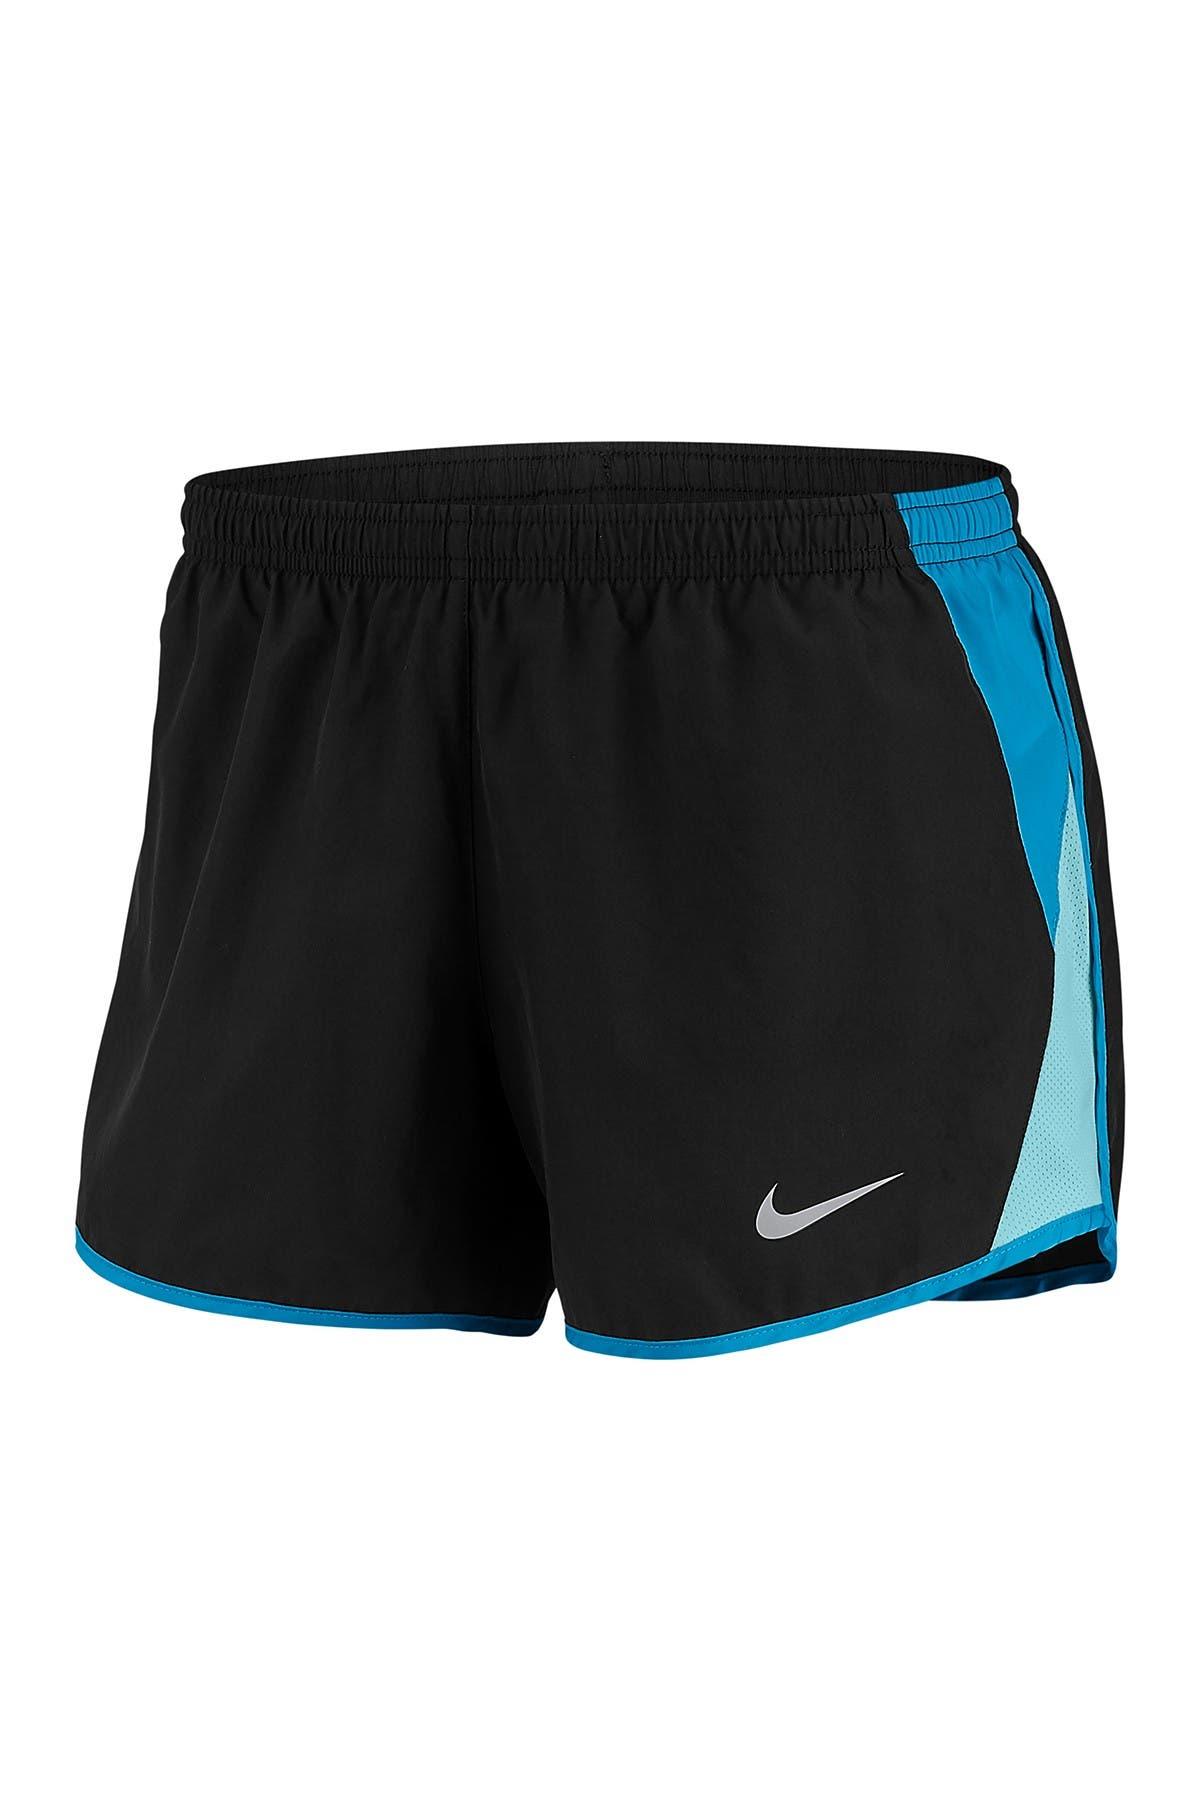 Image of Nike 10K Dri-FIT Running Shorts